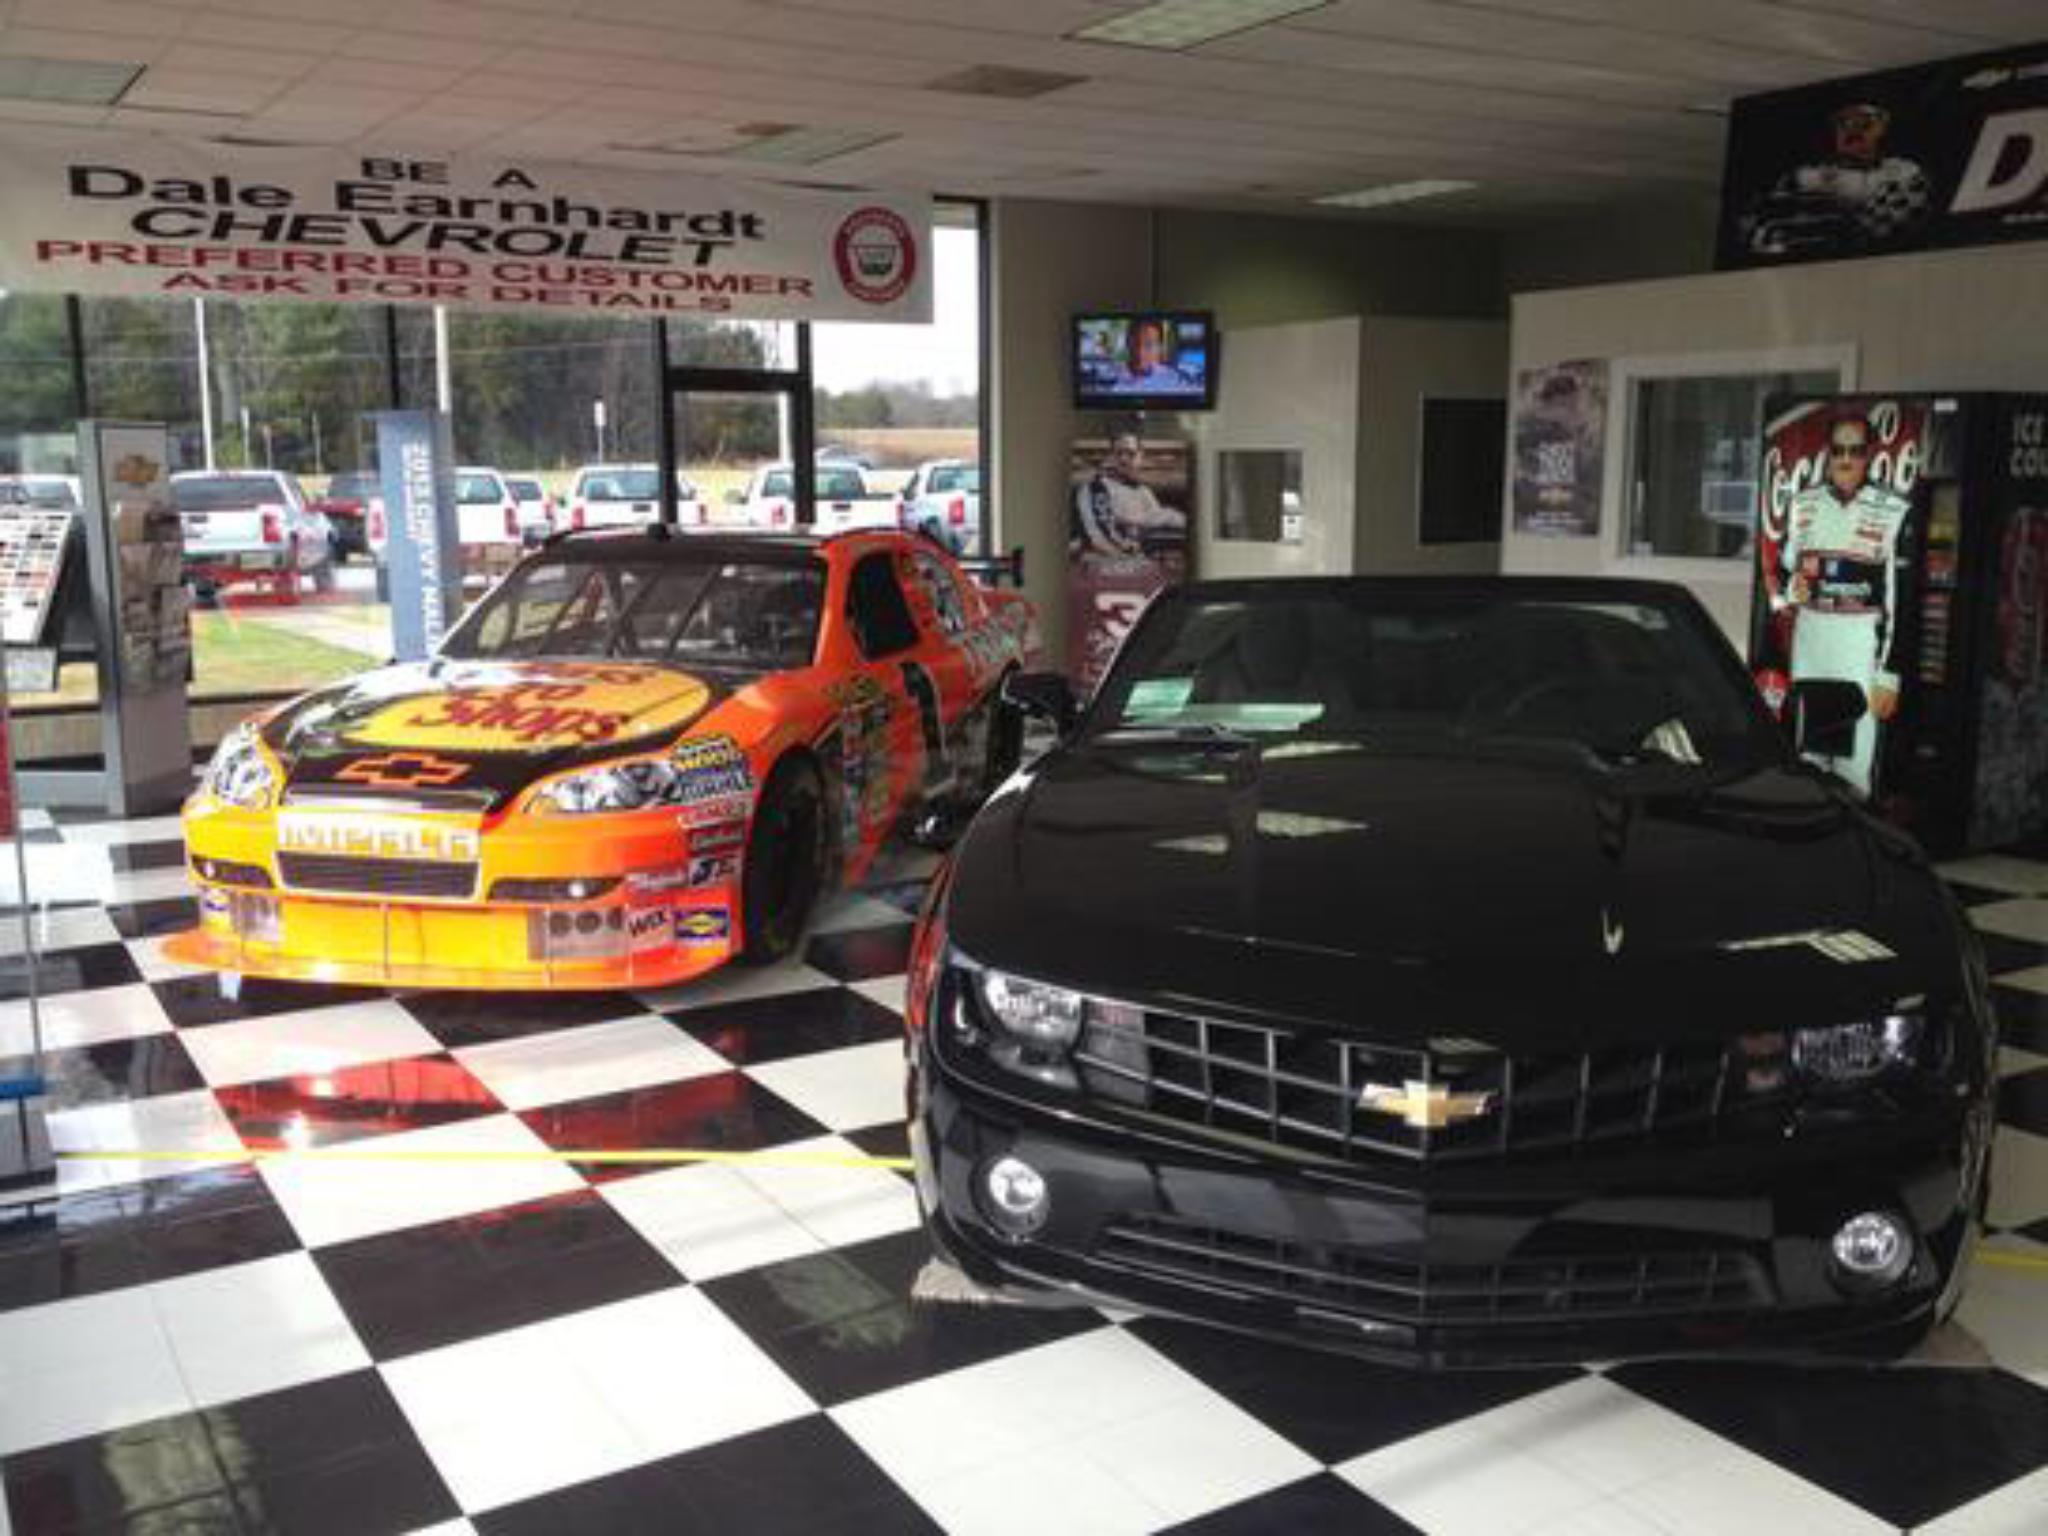 Dale Earnhardt Chevrolet Dealership Newton North Carolina Chevrolet Dealership Dale Earnhardt Chevrolet Car Dealership